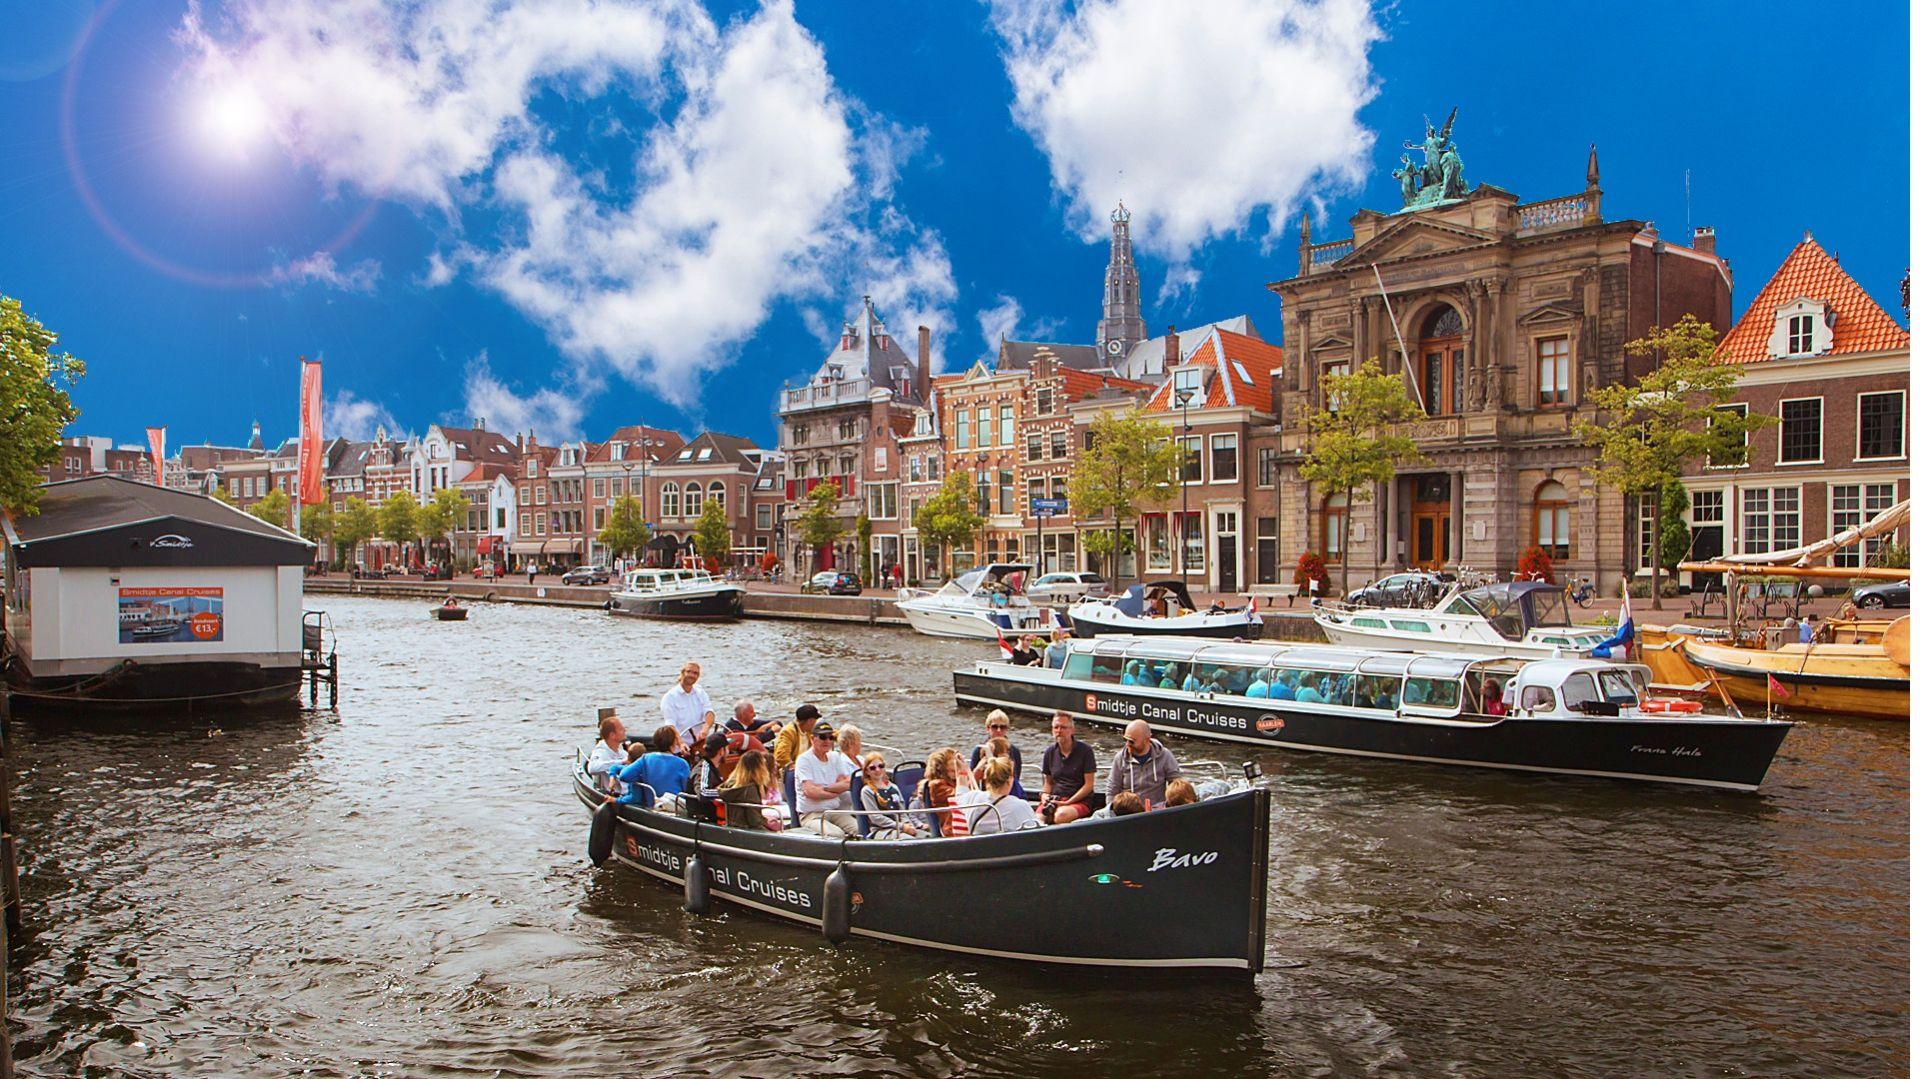 50 minuten grachten cruise in Haarlem